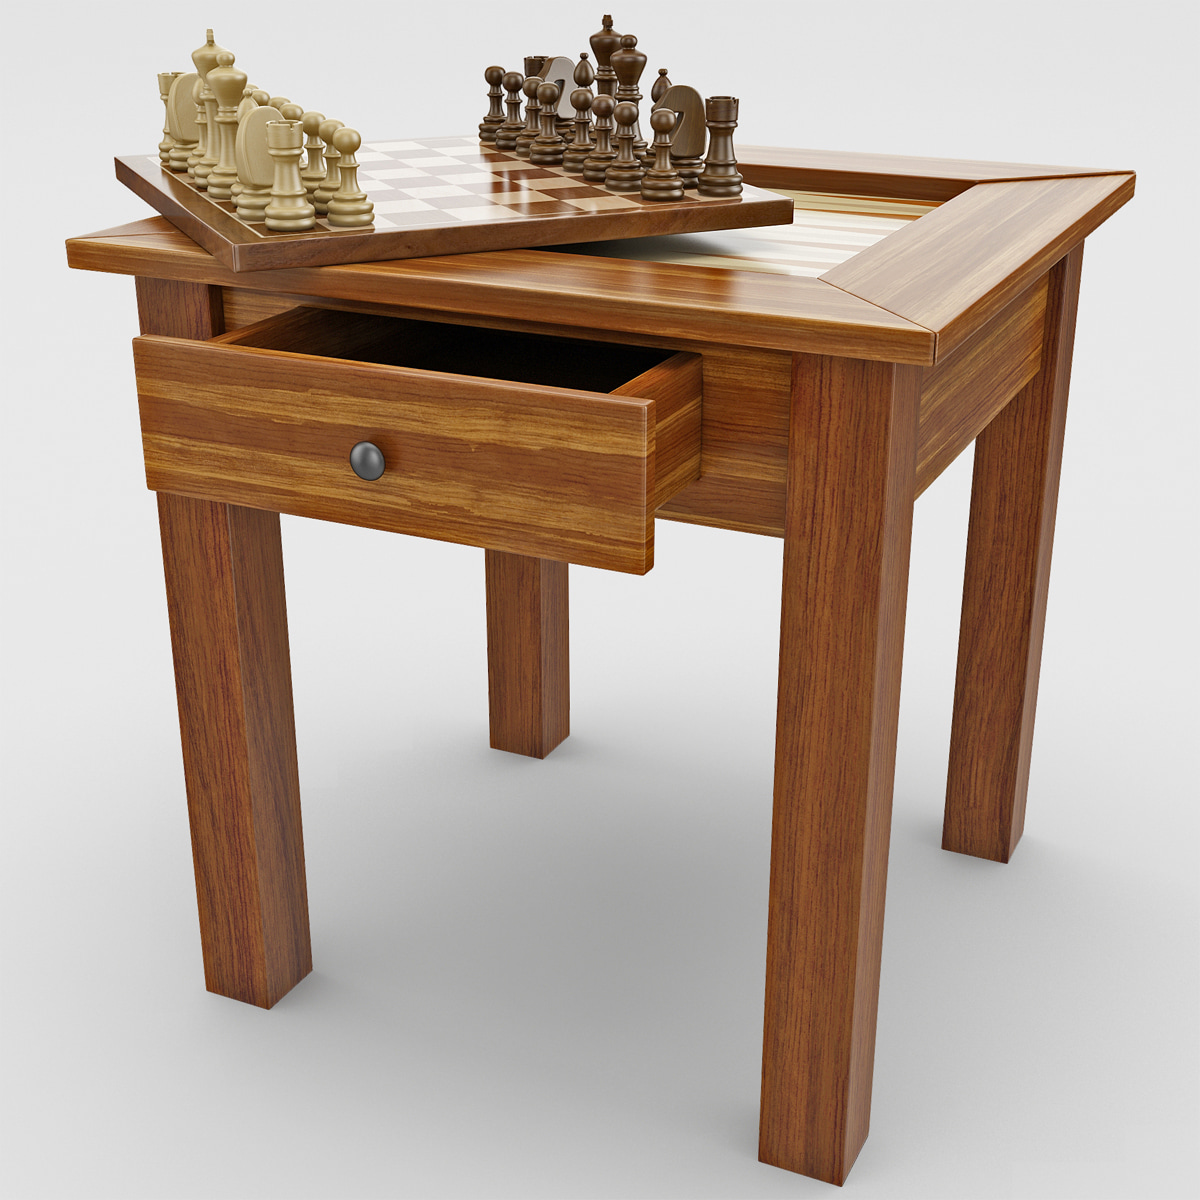 239379_Chess_Backgammon_Table_001.jpg